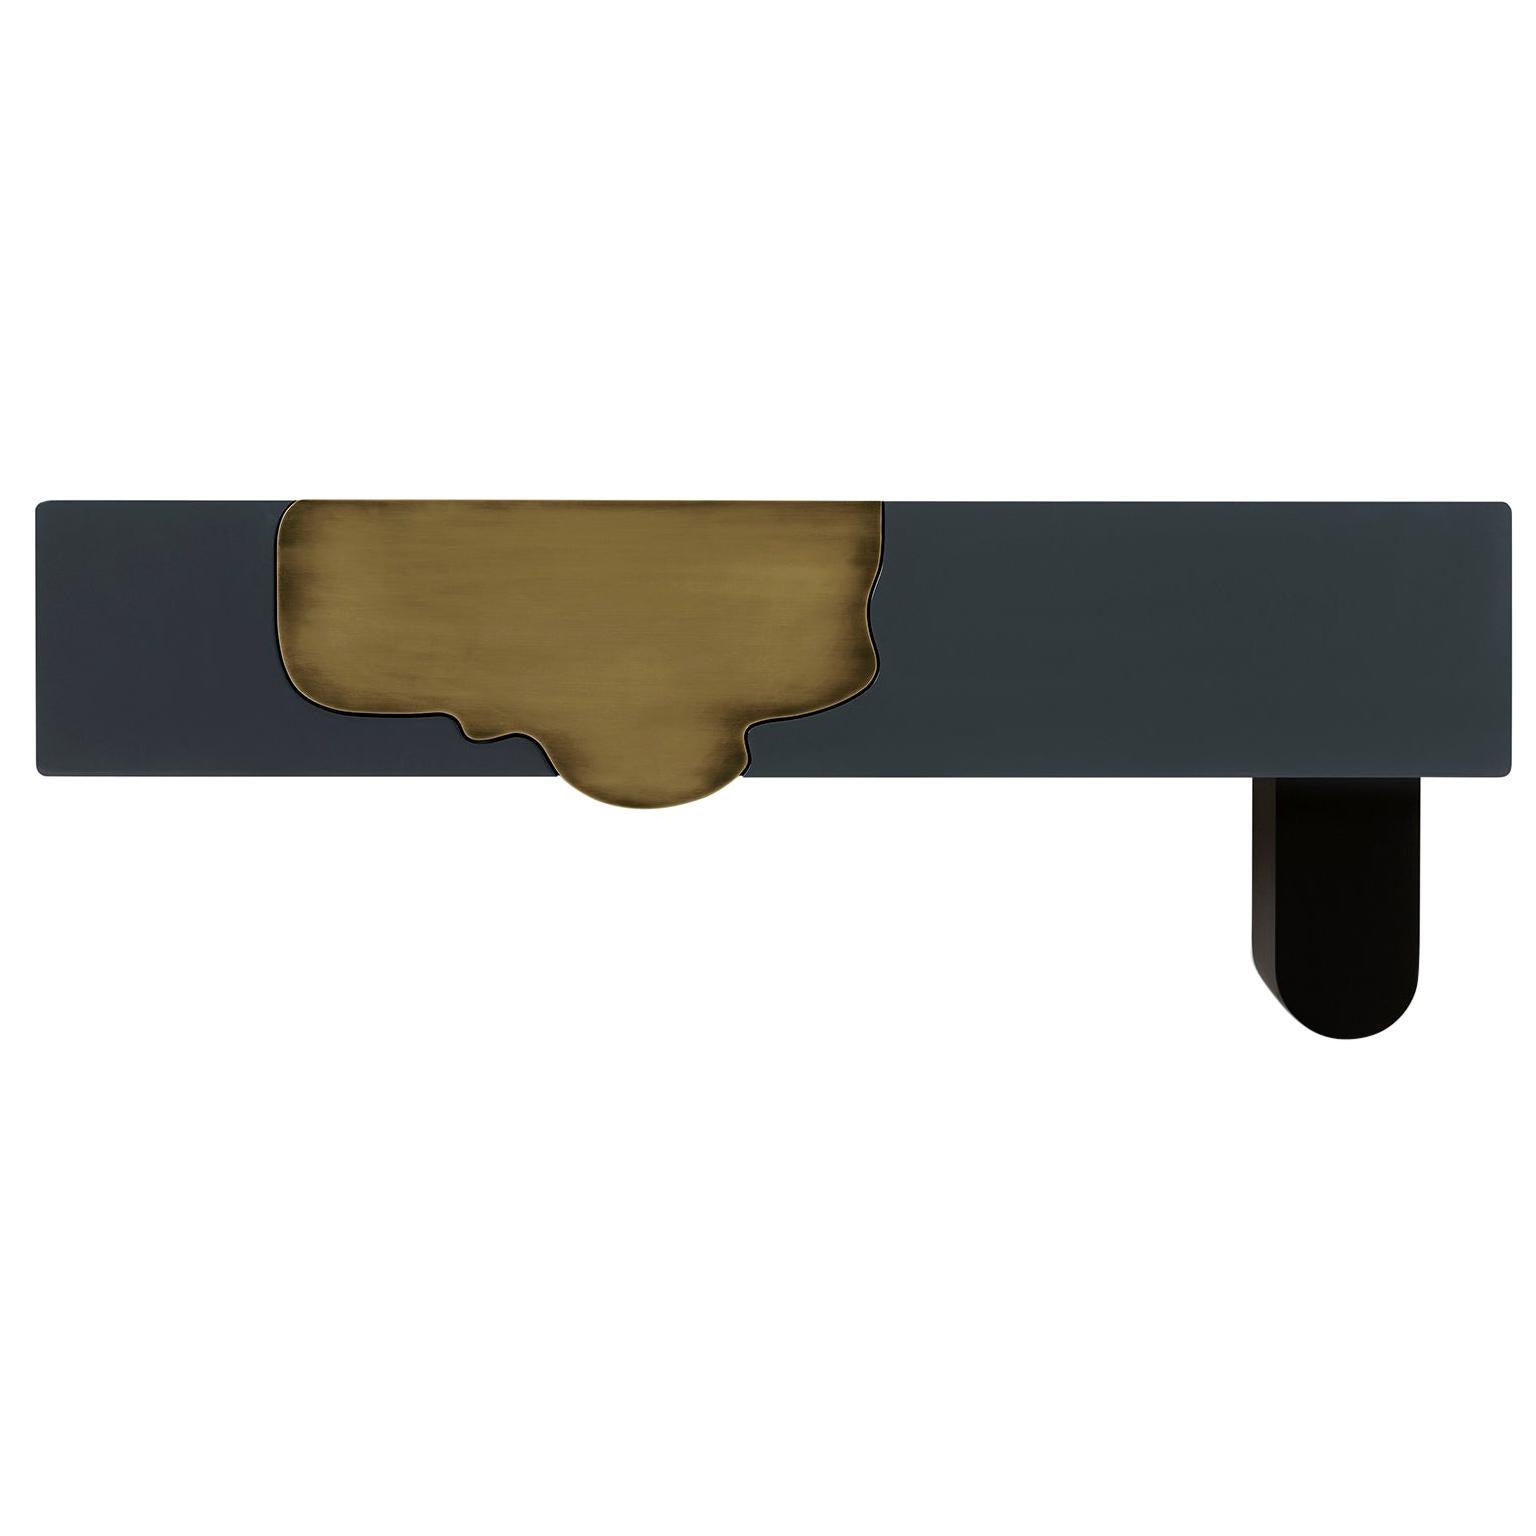 Alma Console Blue-Grey Black Lacquered Dark Oxidized Brass One Leg Wall Mounted